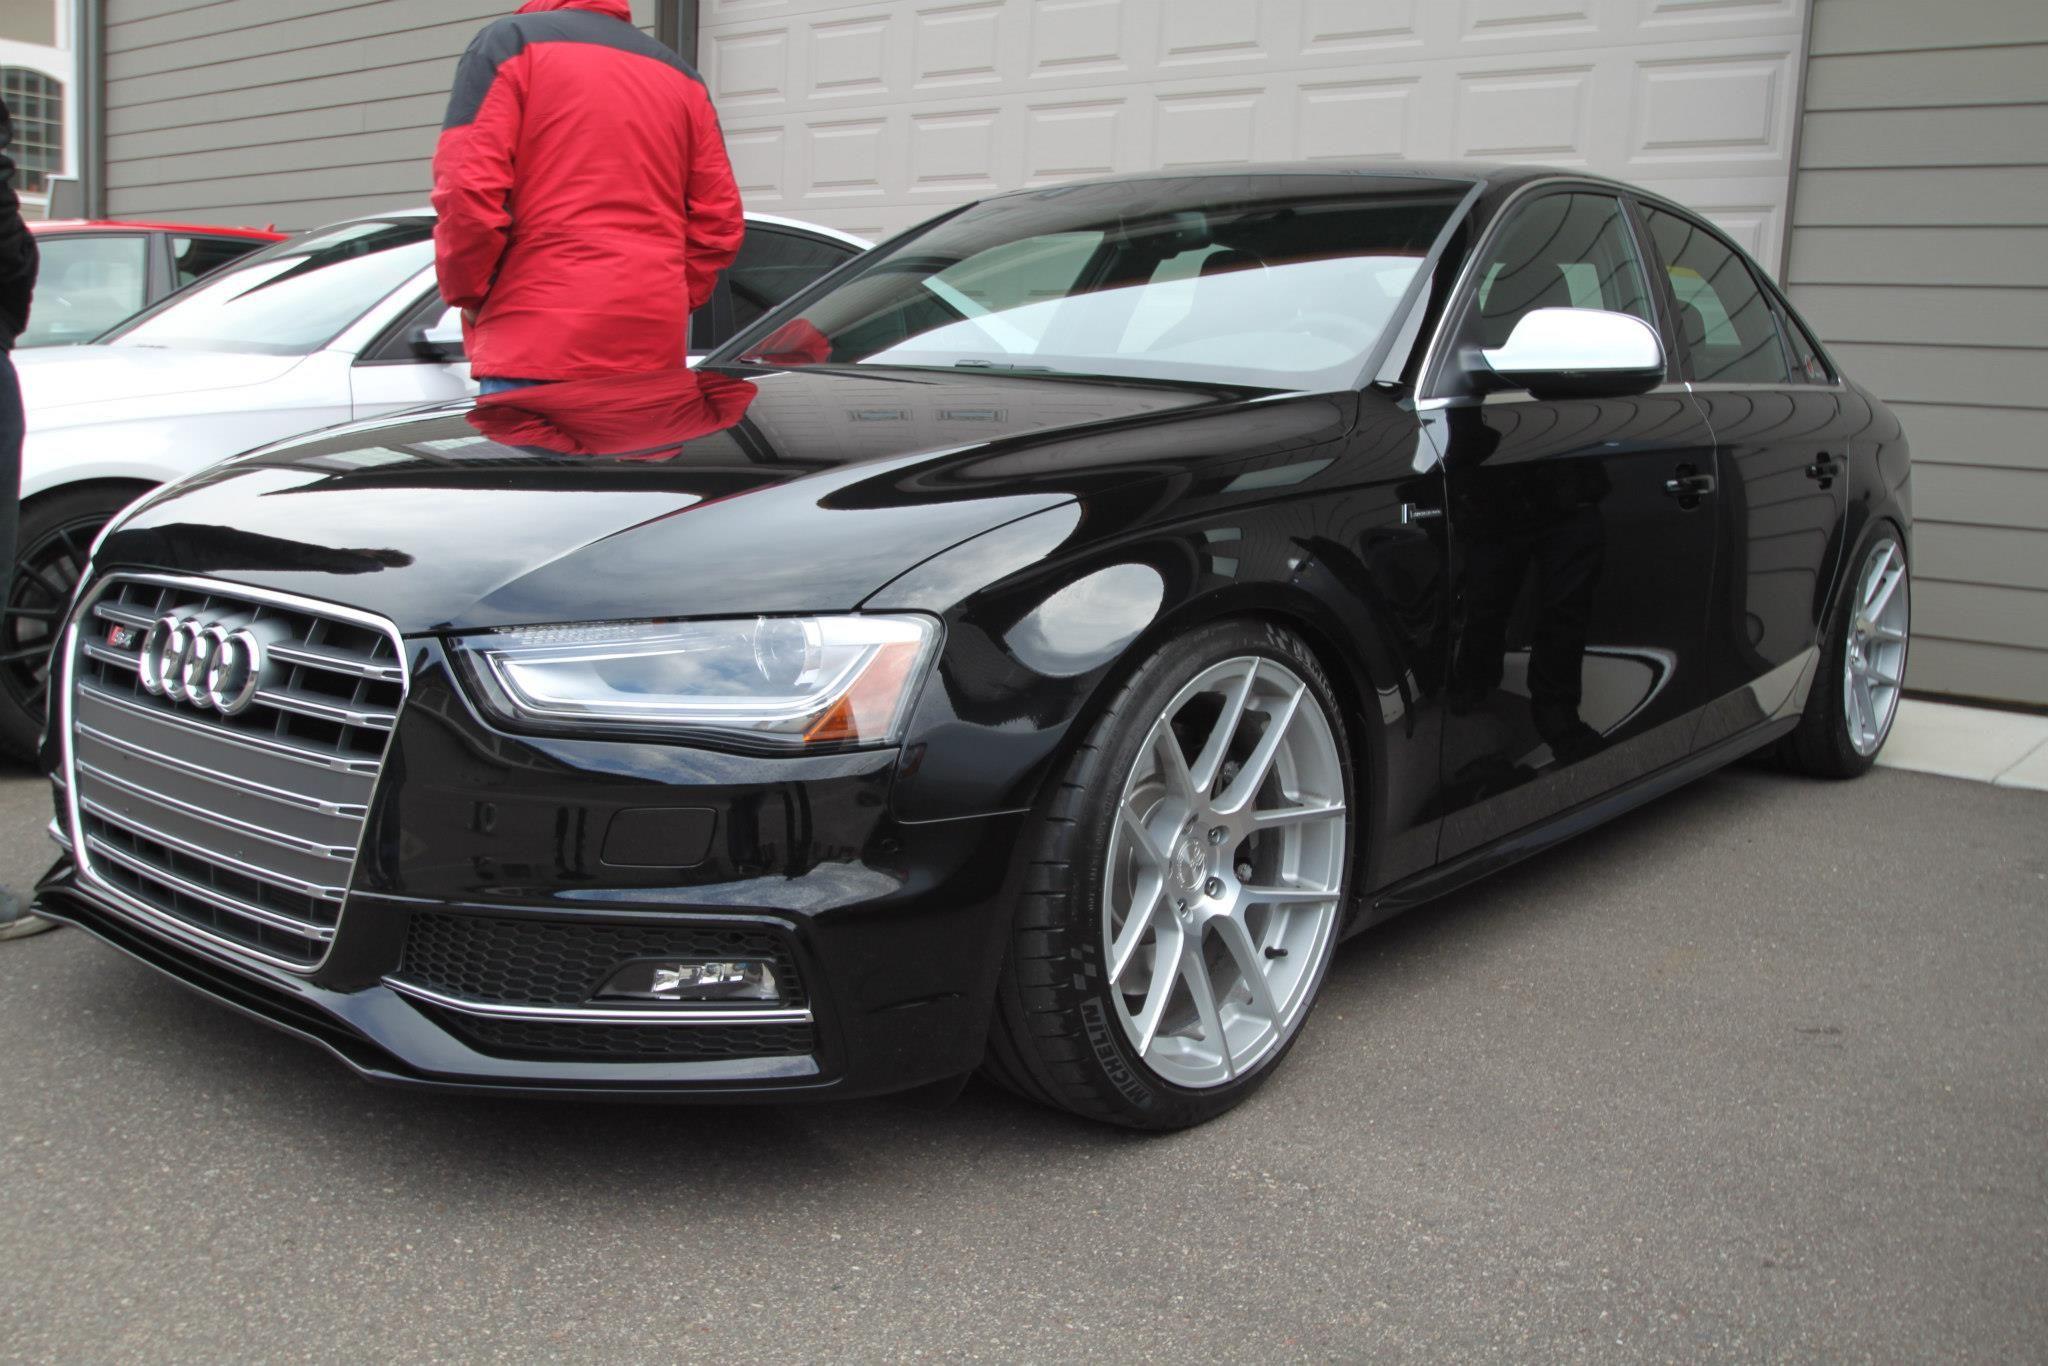 Audi B8 S4 Black Ag M580 Gloss Graphite 12 Audi Toyota Hilux Audi A4